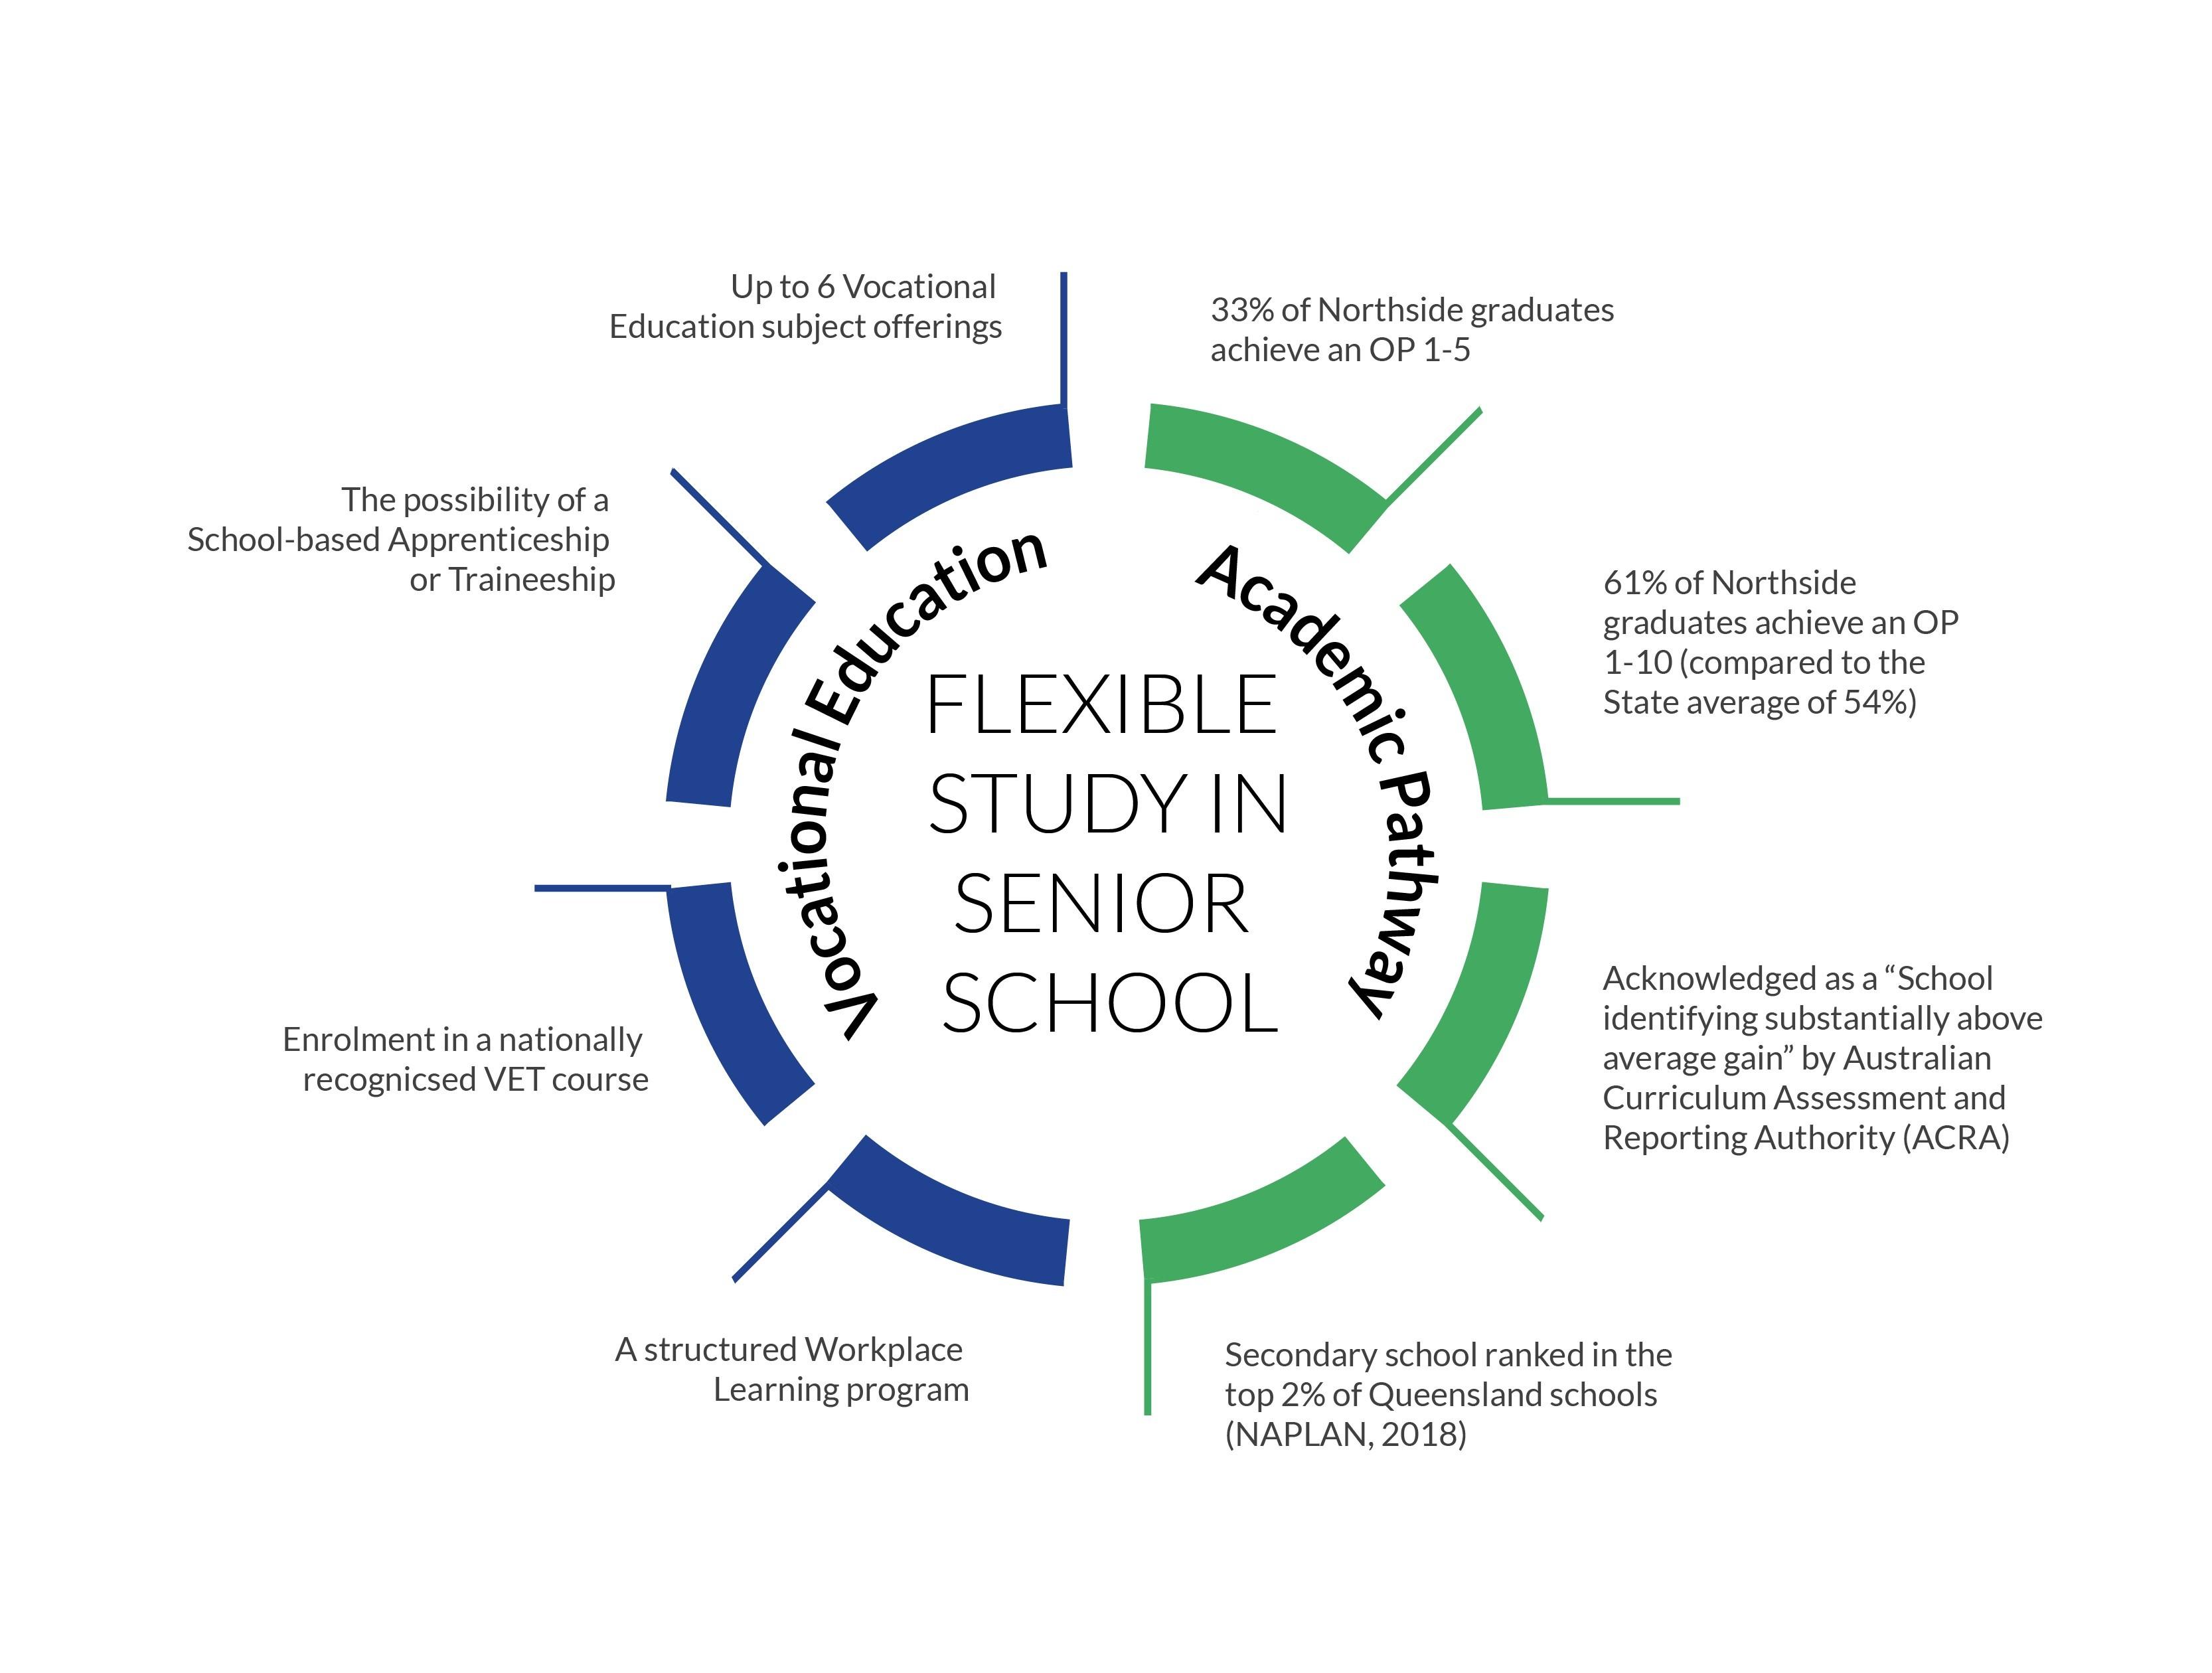 Flexible study in Senior School